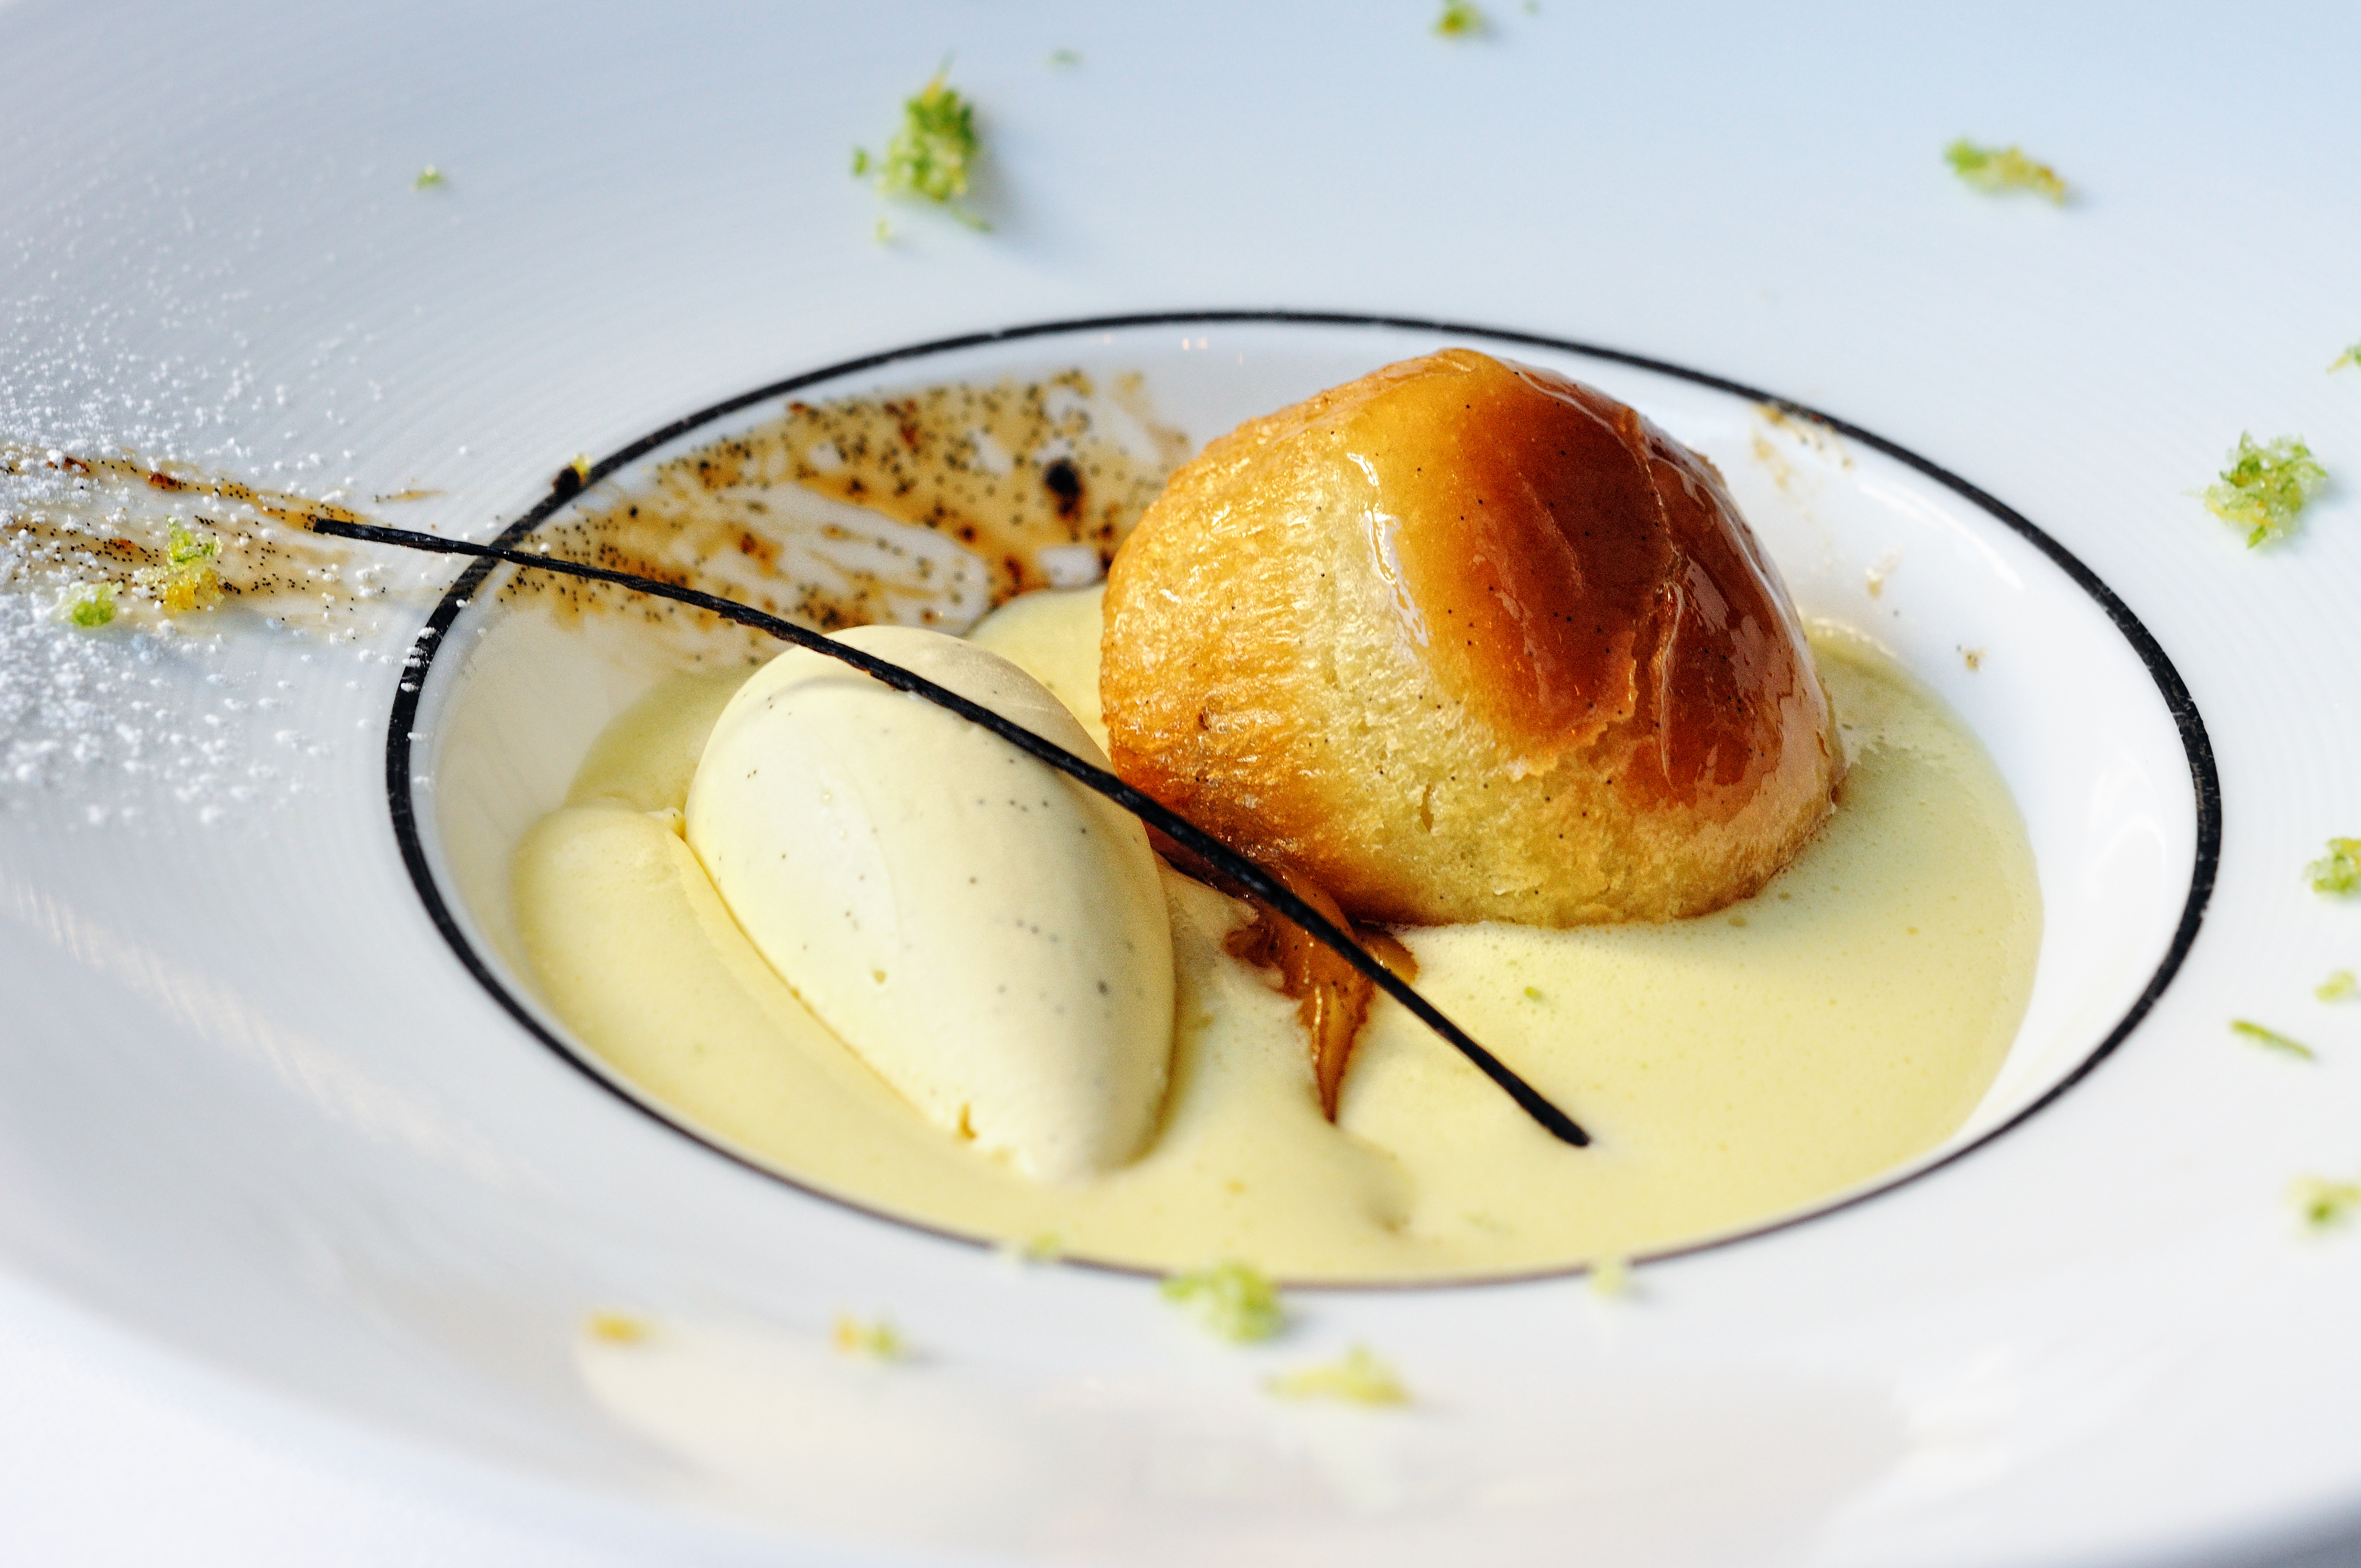 File:Lime sabayon with vanilla ice cream, roasted mango